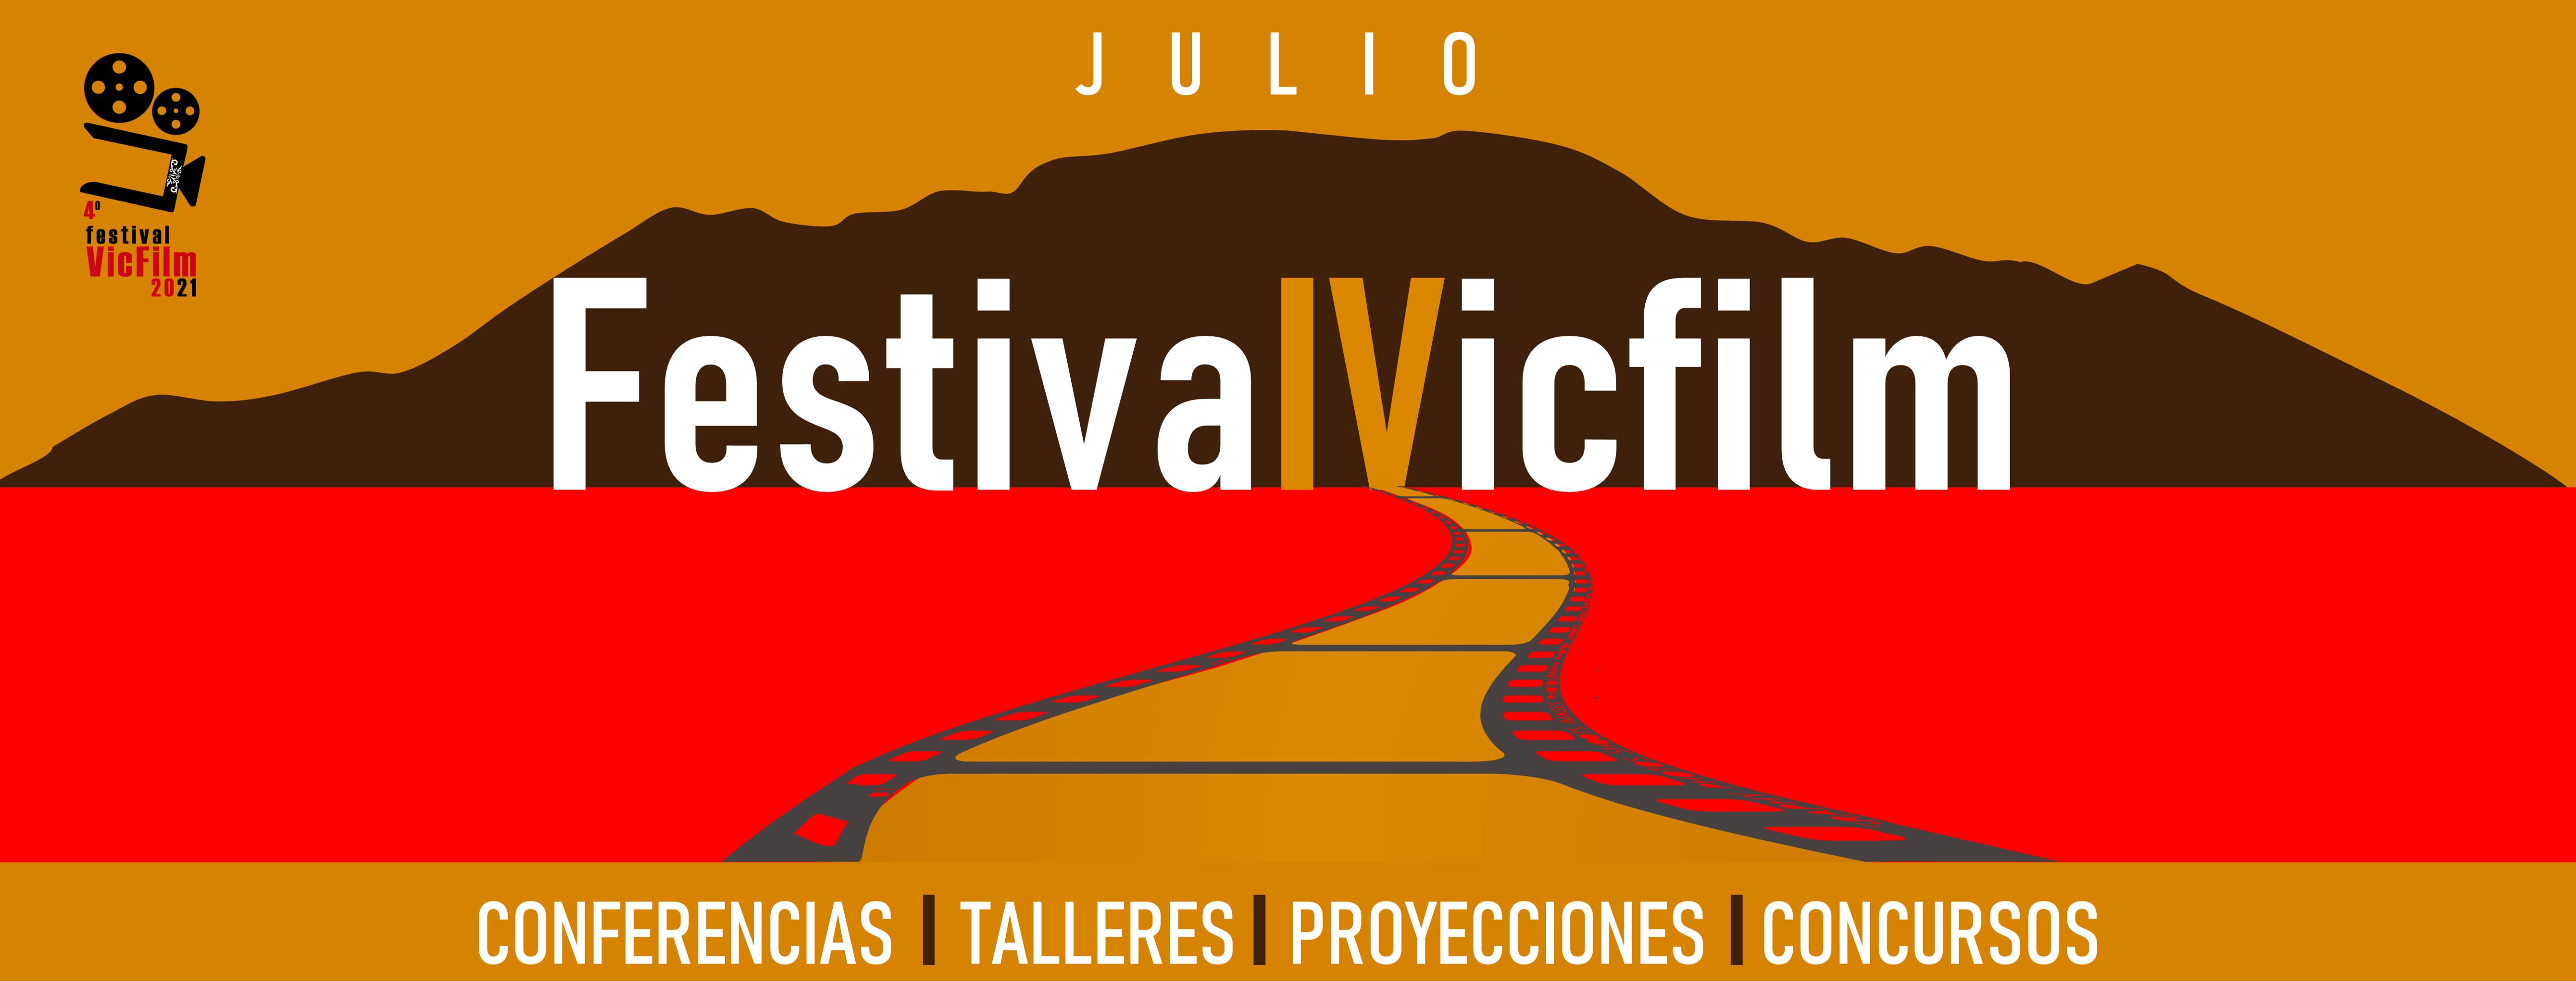 Festivalvicfilm - Festival Vic FILM